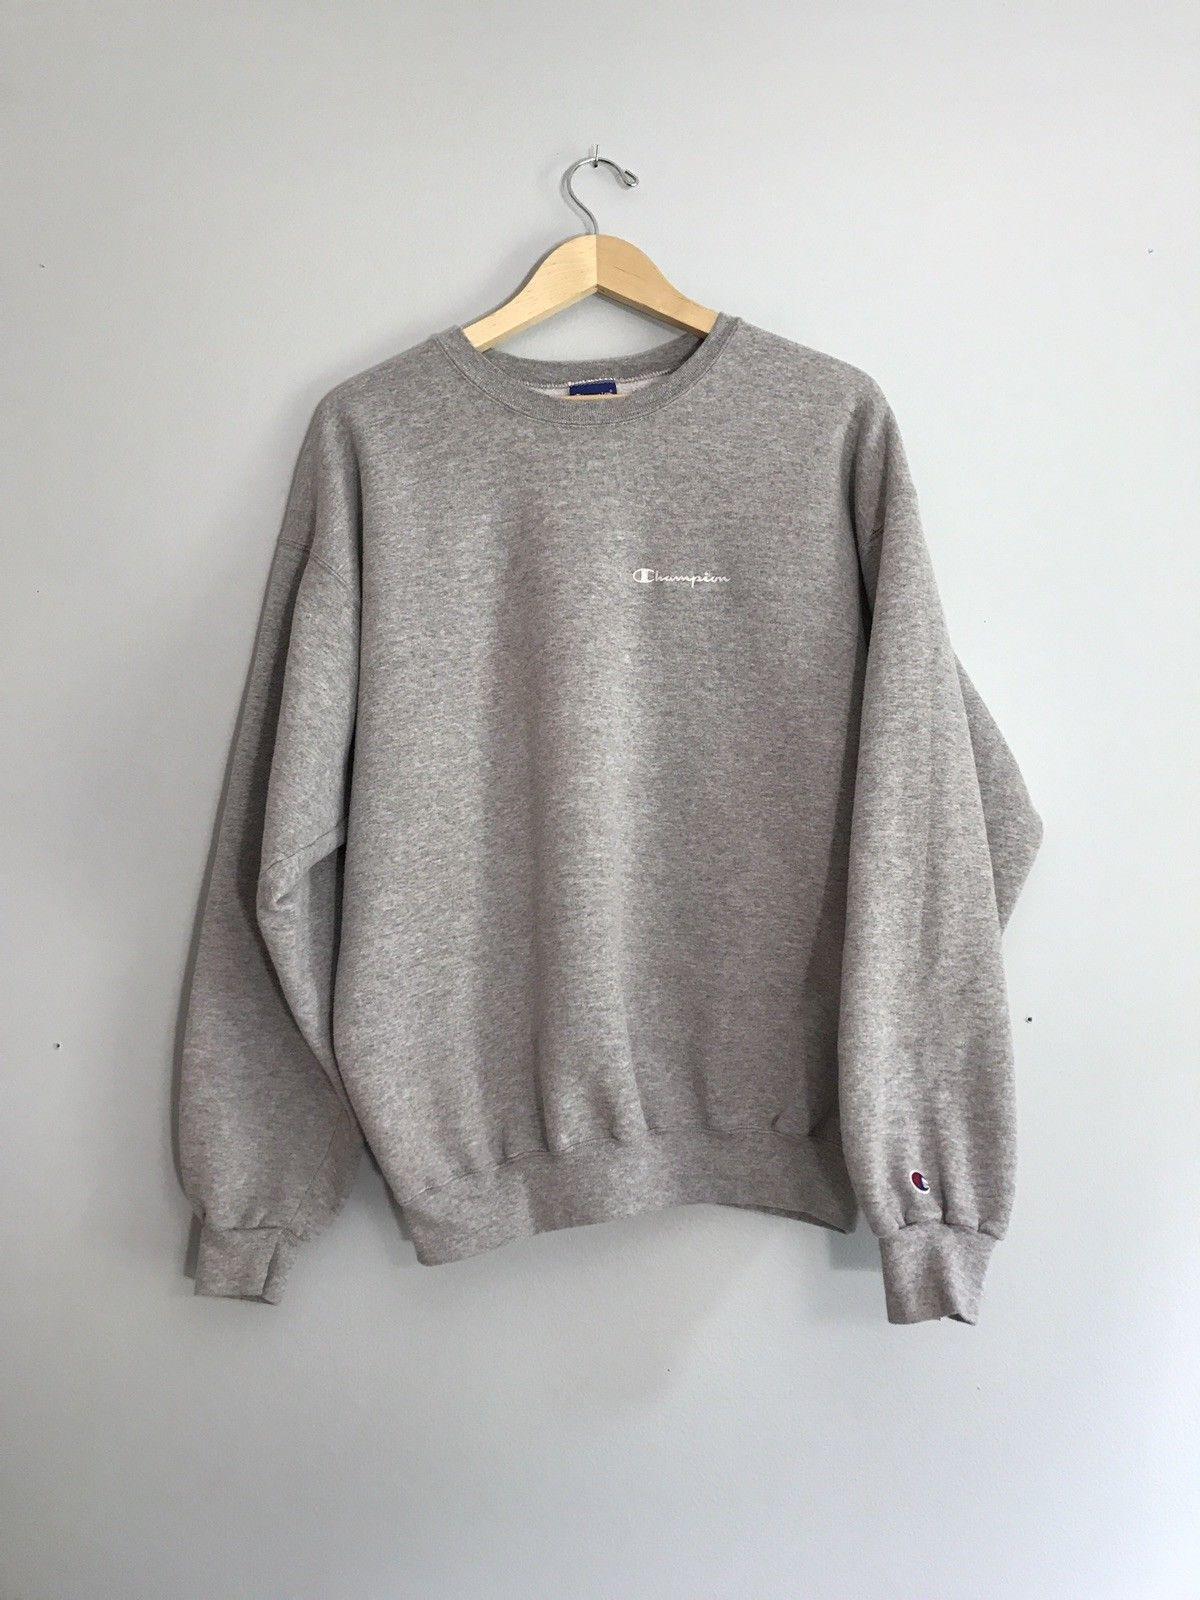 b3b445b55 Vintage Champion Script Logo Crewneck Sweatshirt Size XL Grey ...